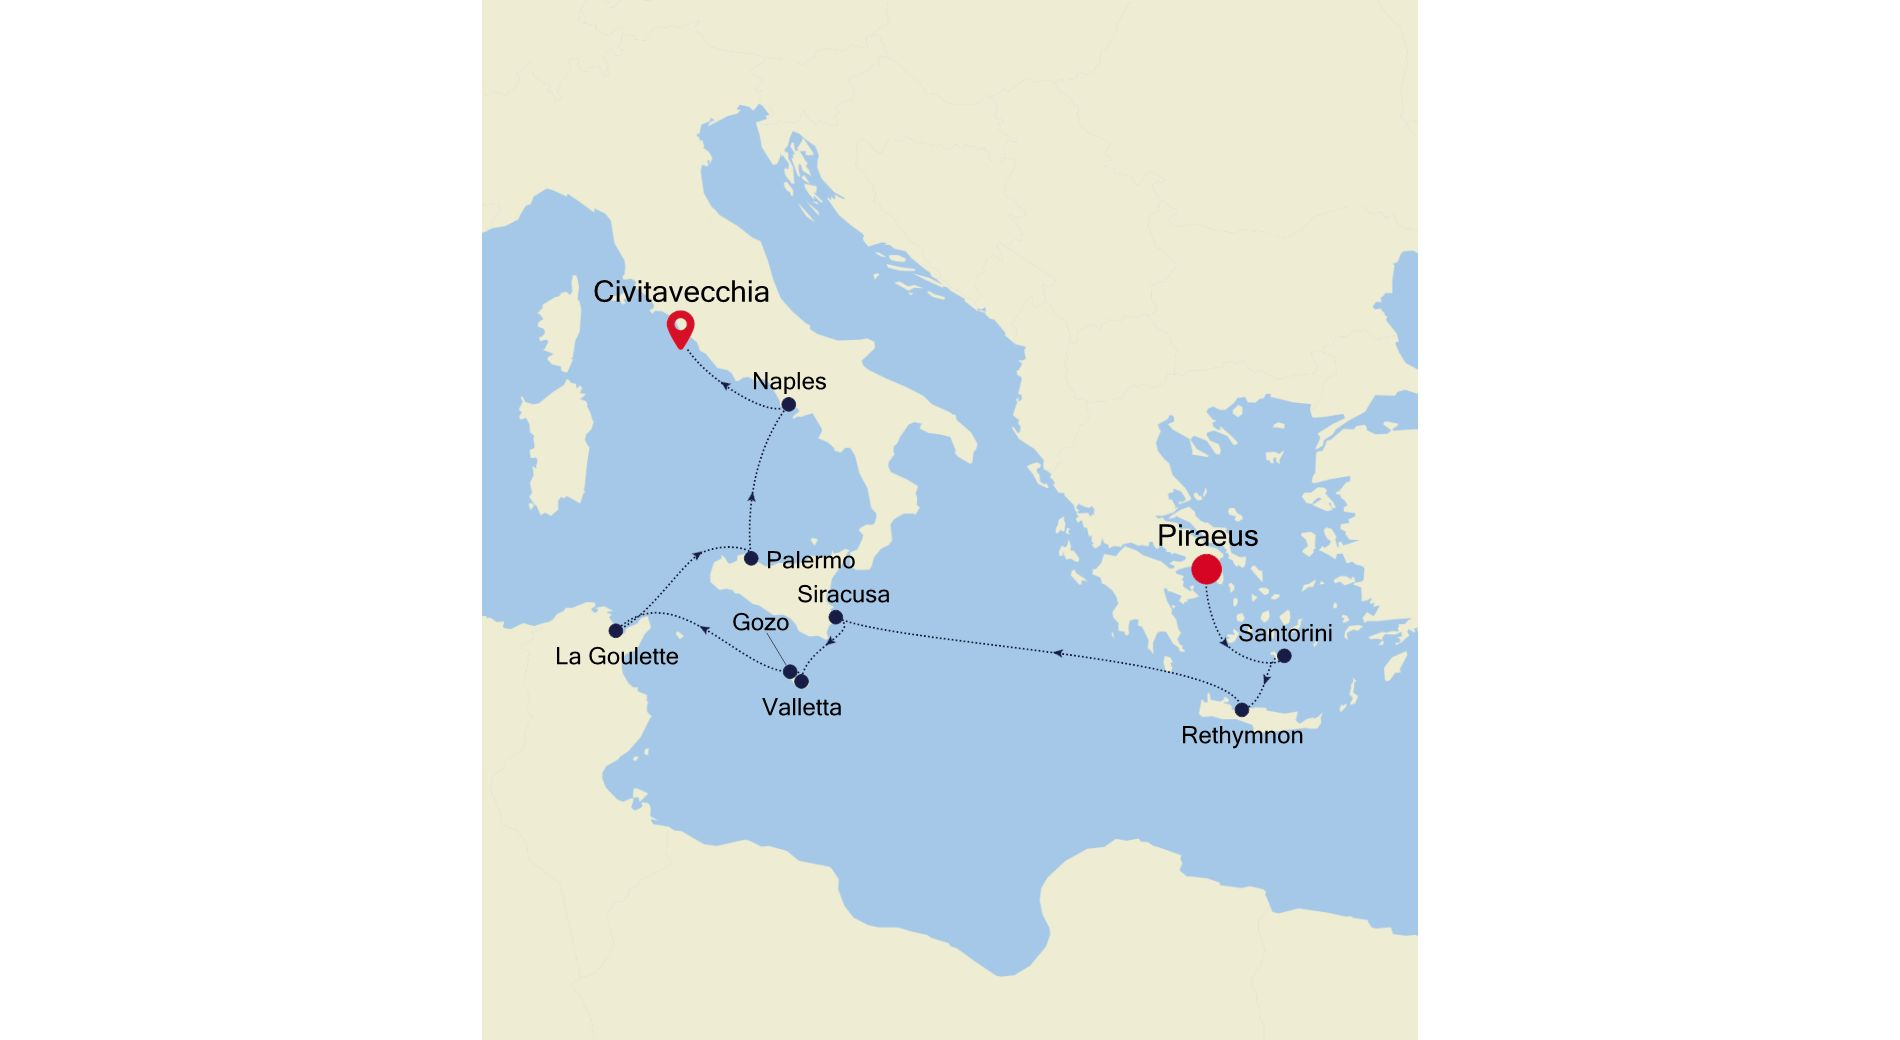 SS211005010 - Piraeus to Civitavecchia